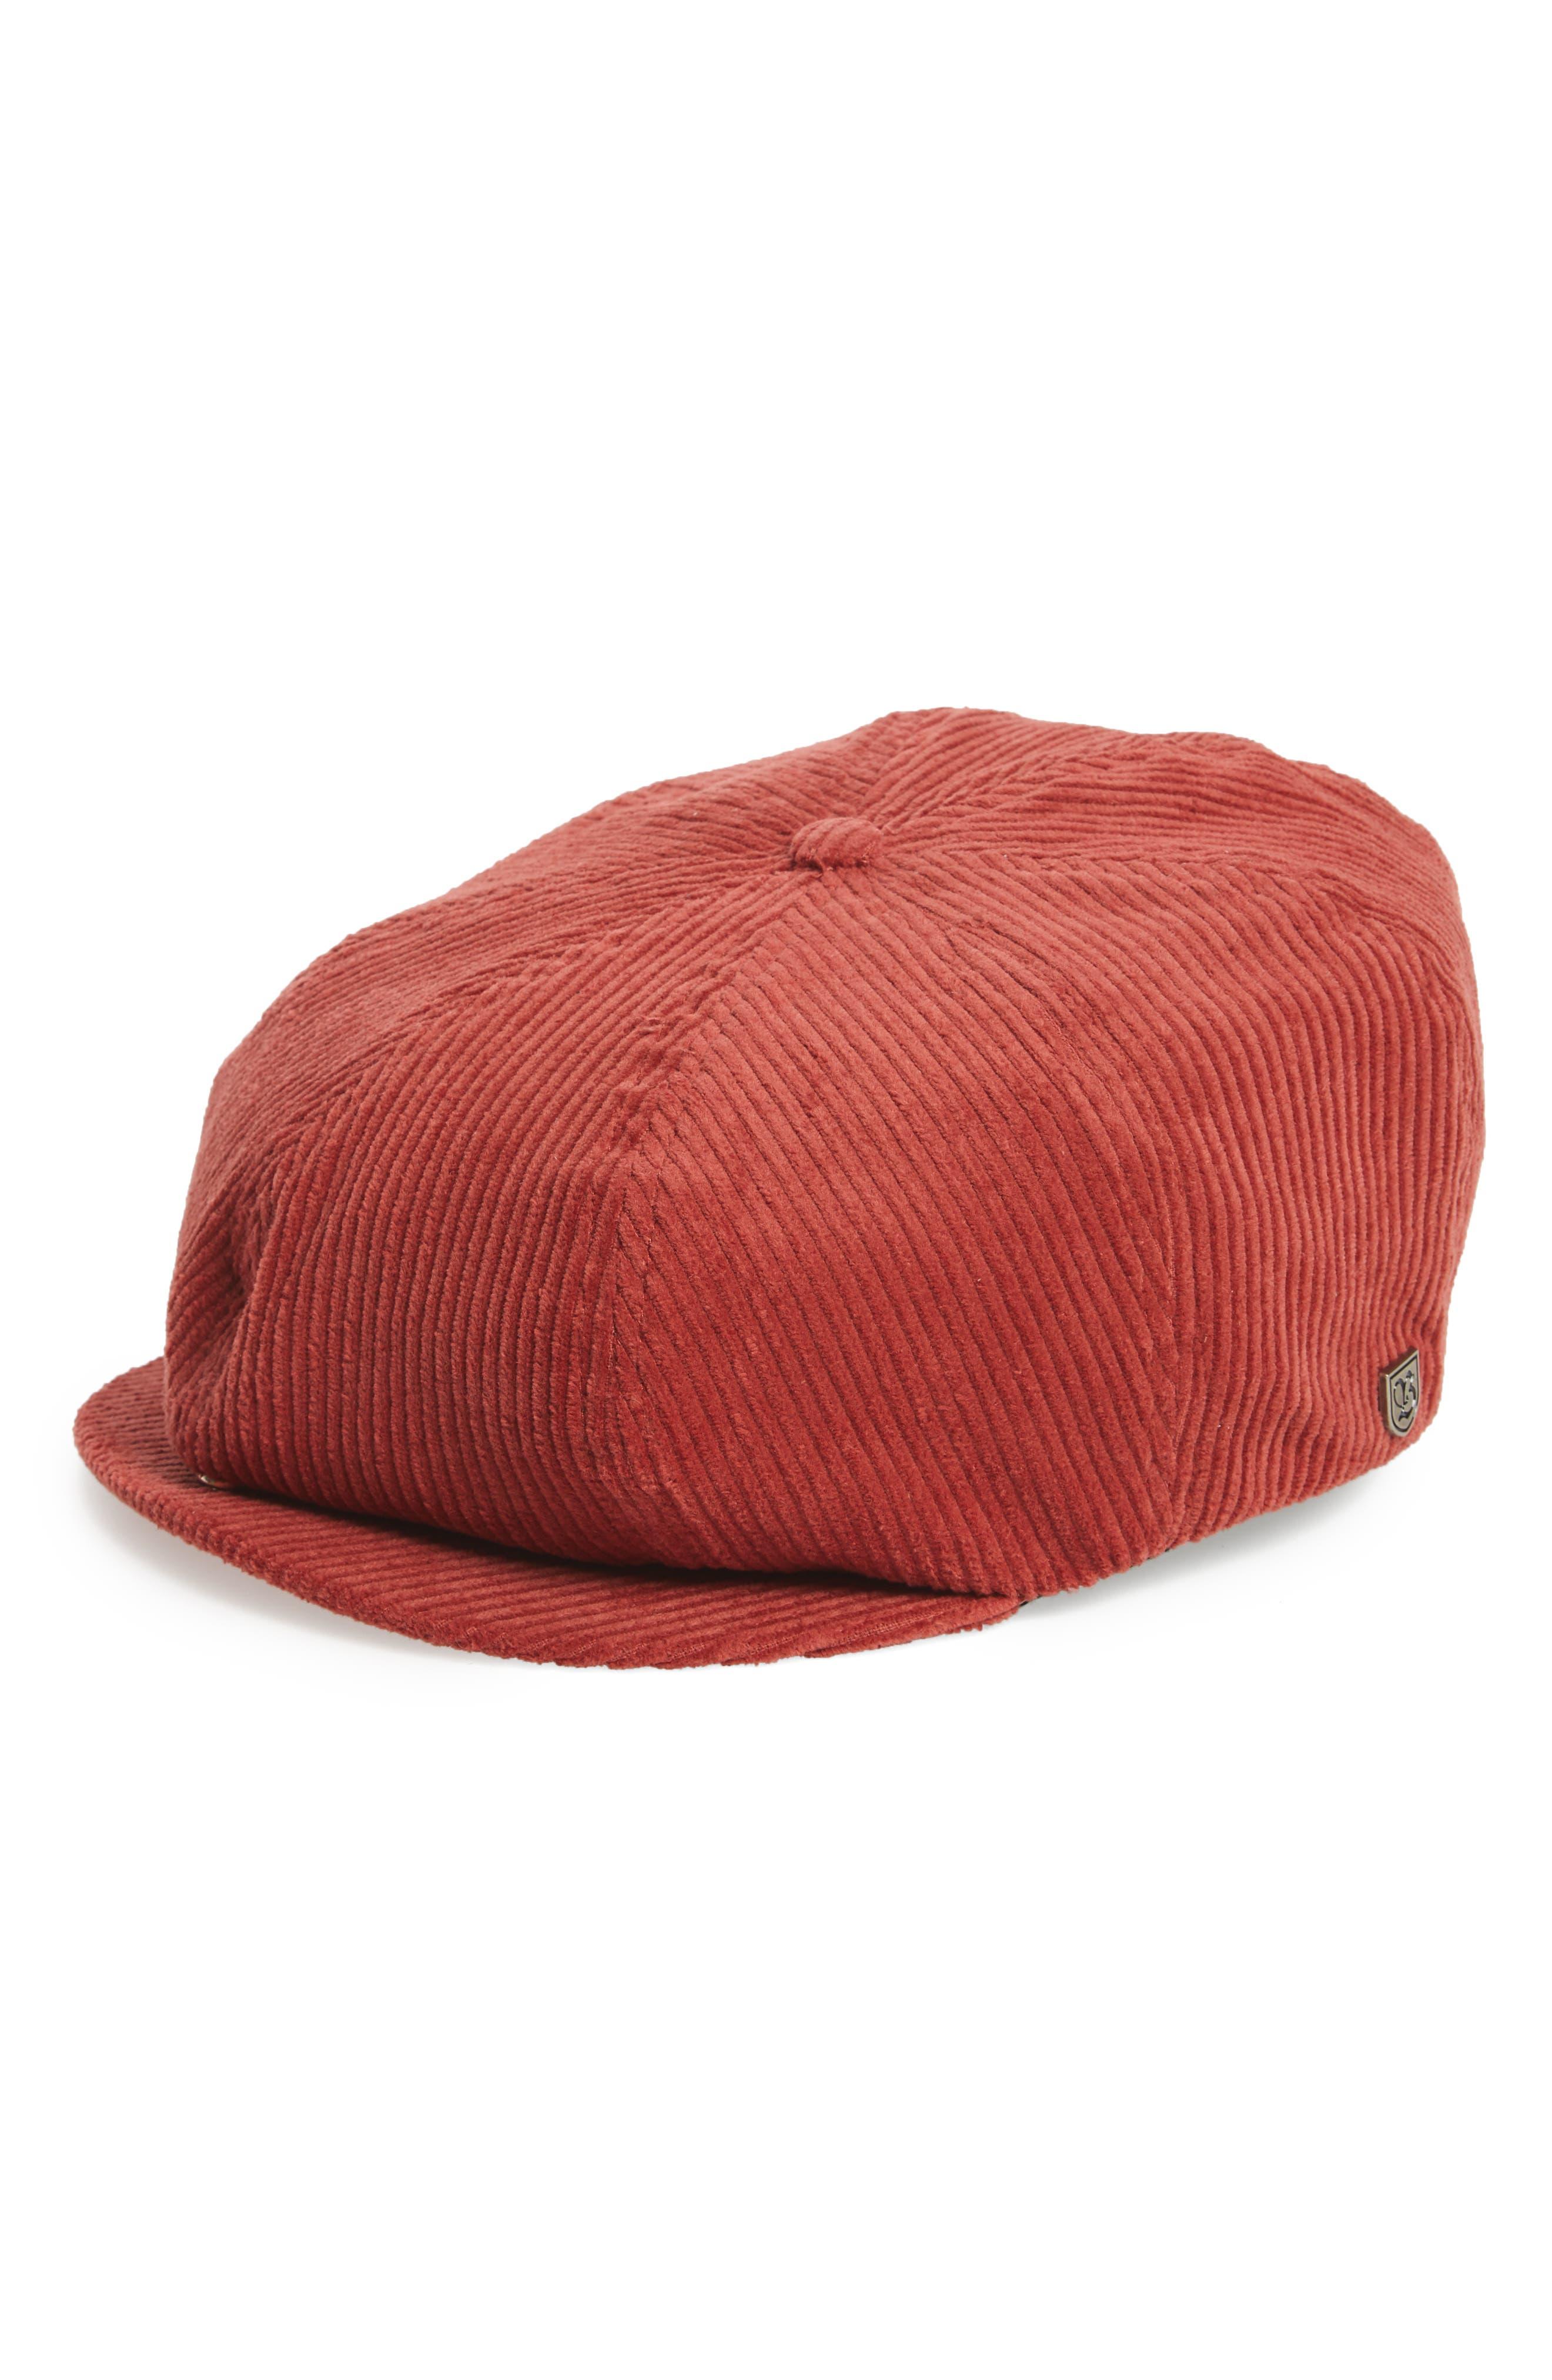 Brood Corduroy Newsboy Cap,                         Main,                         color, Tan Stripe